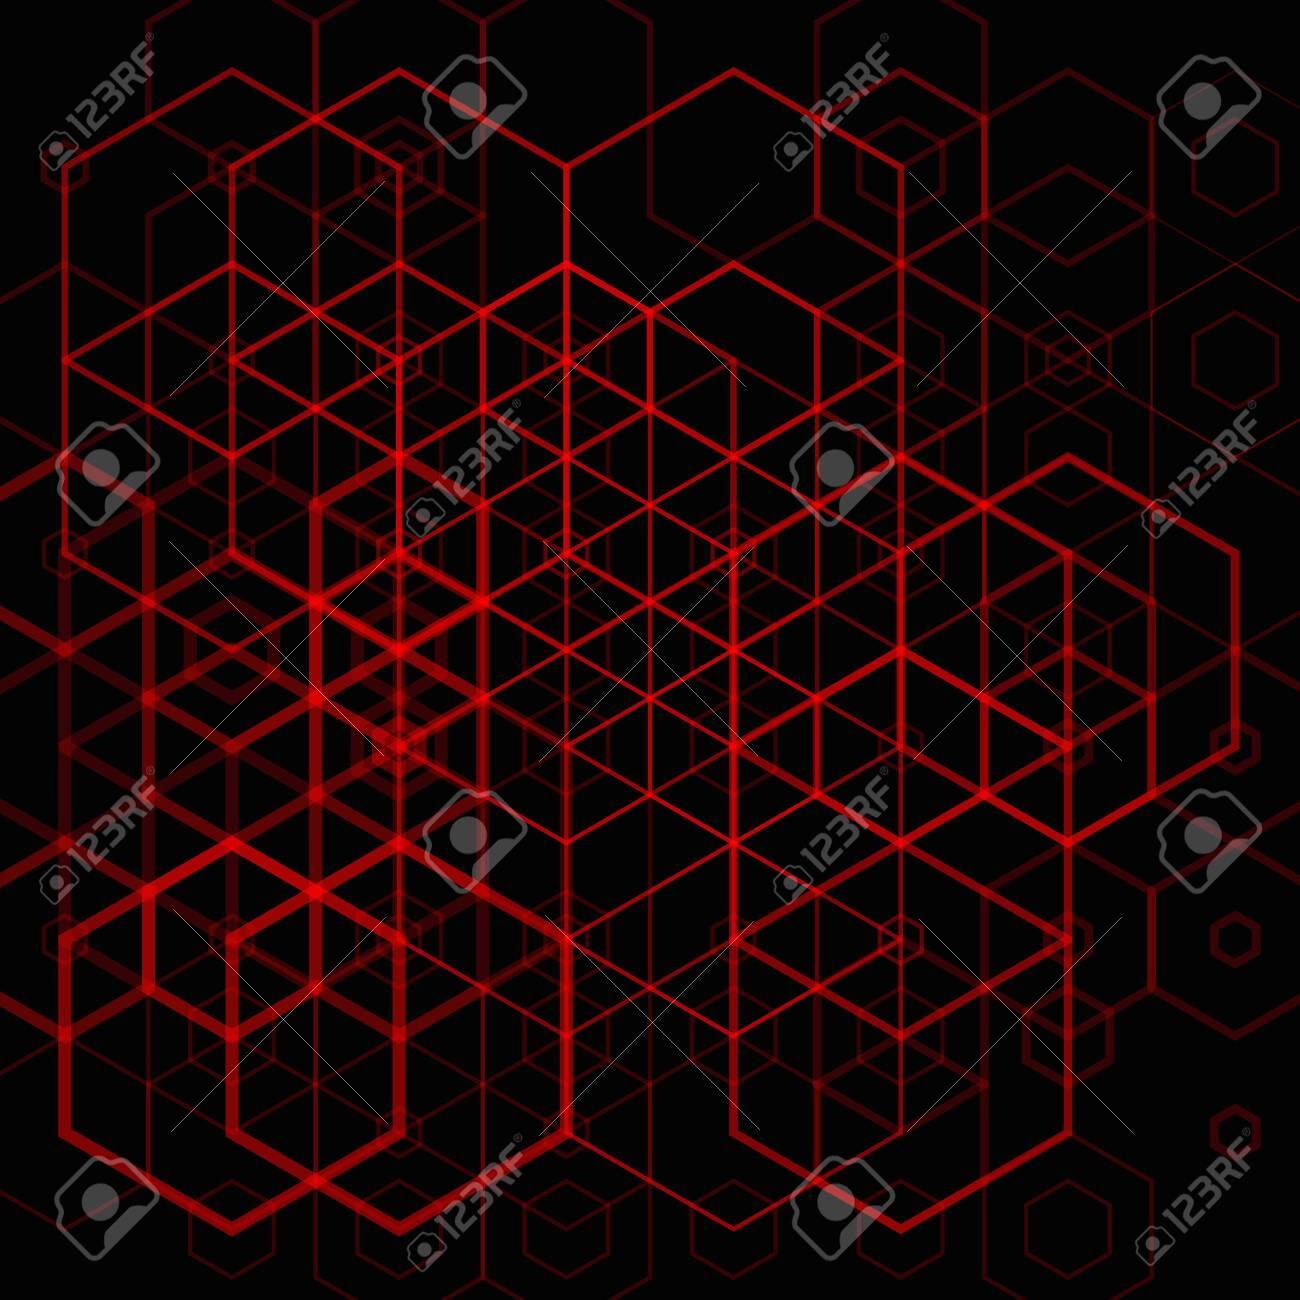 Abstract red hexgonal pattern on dark background - 148479244